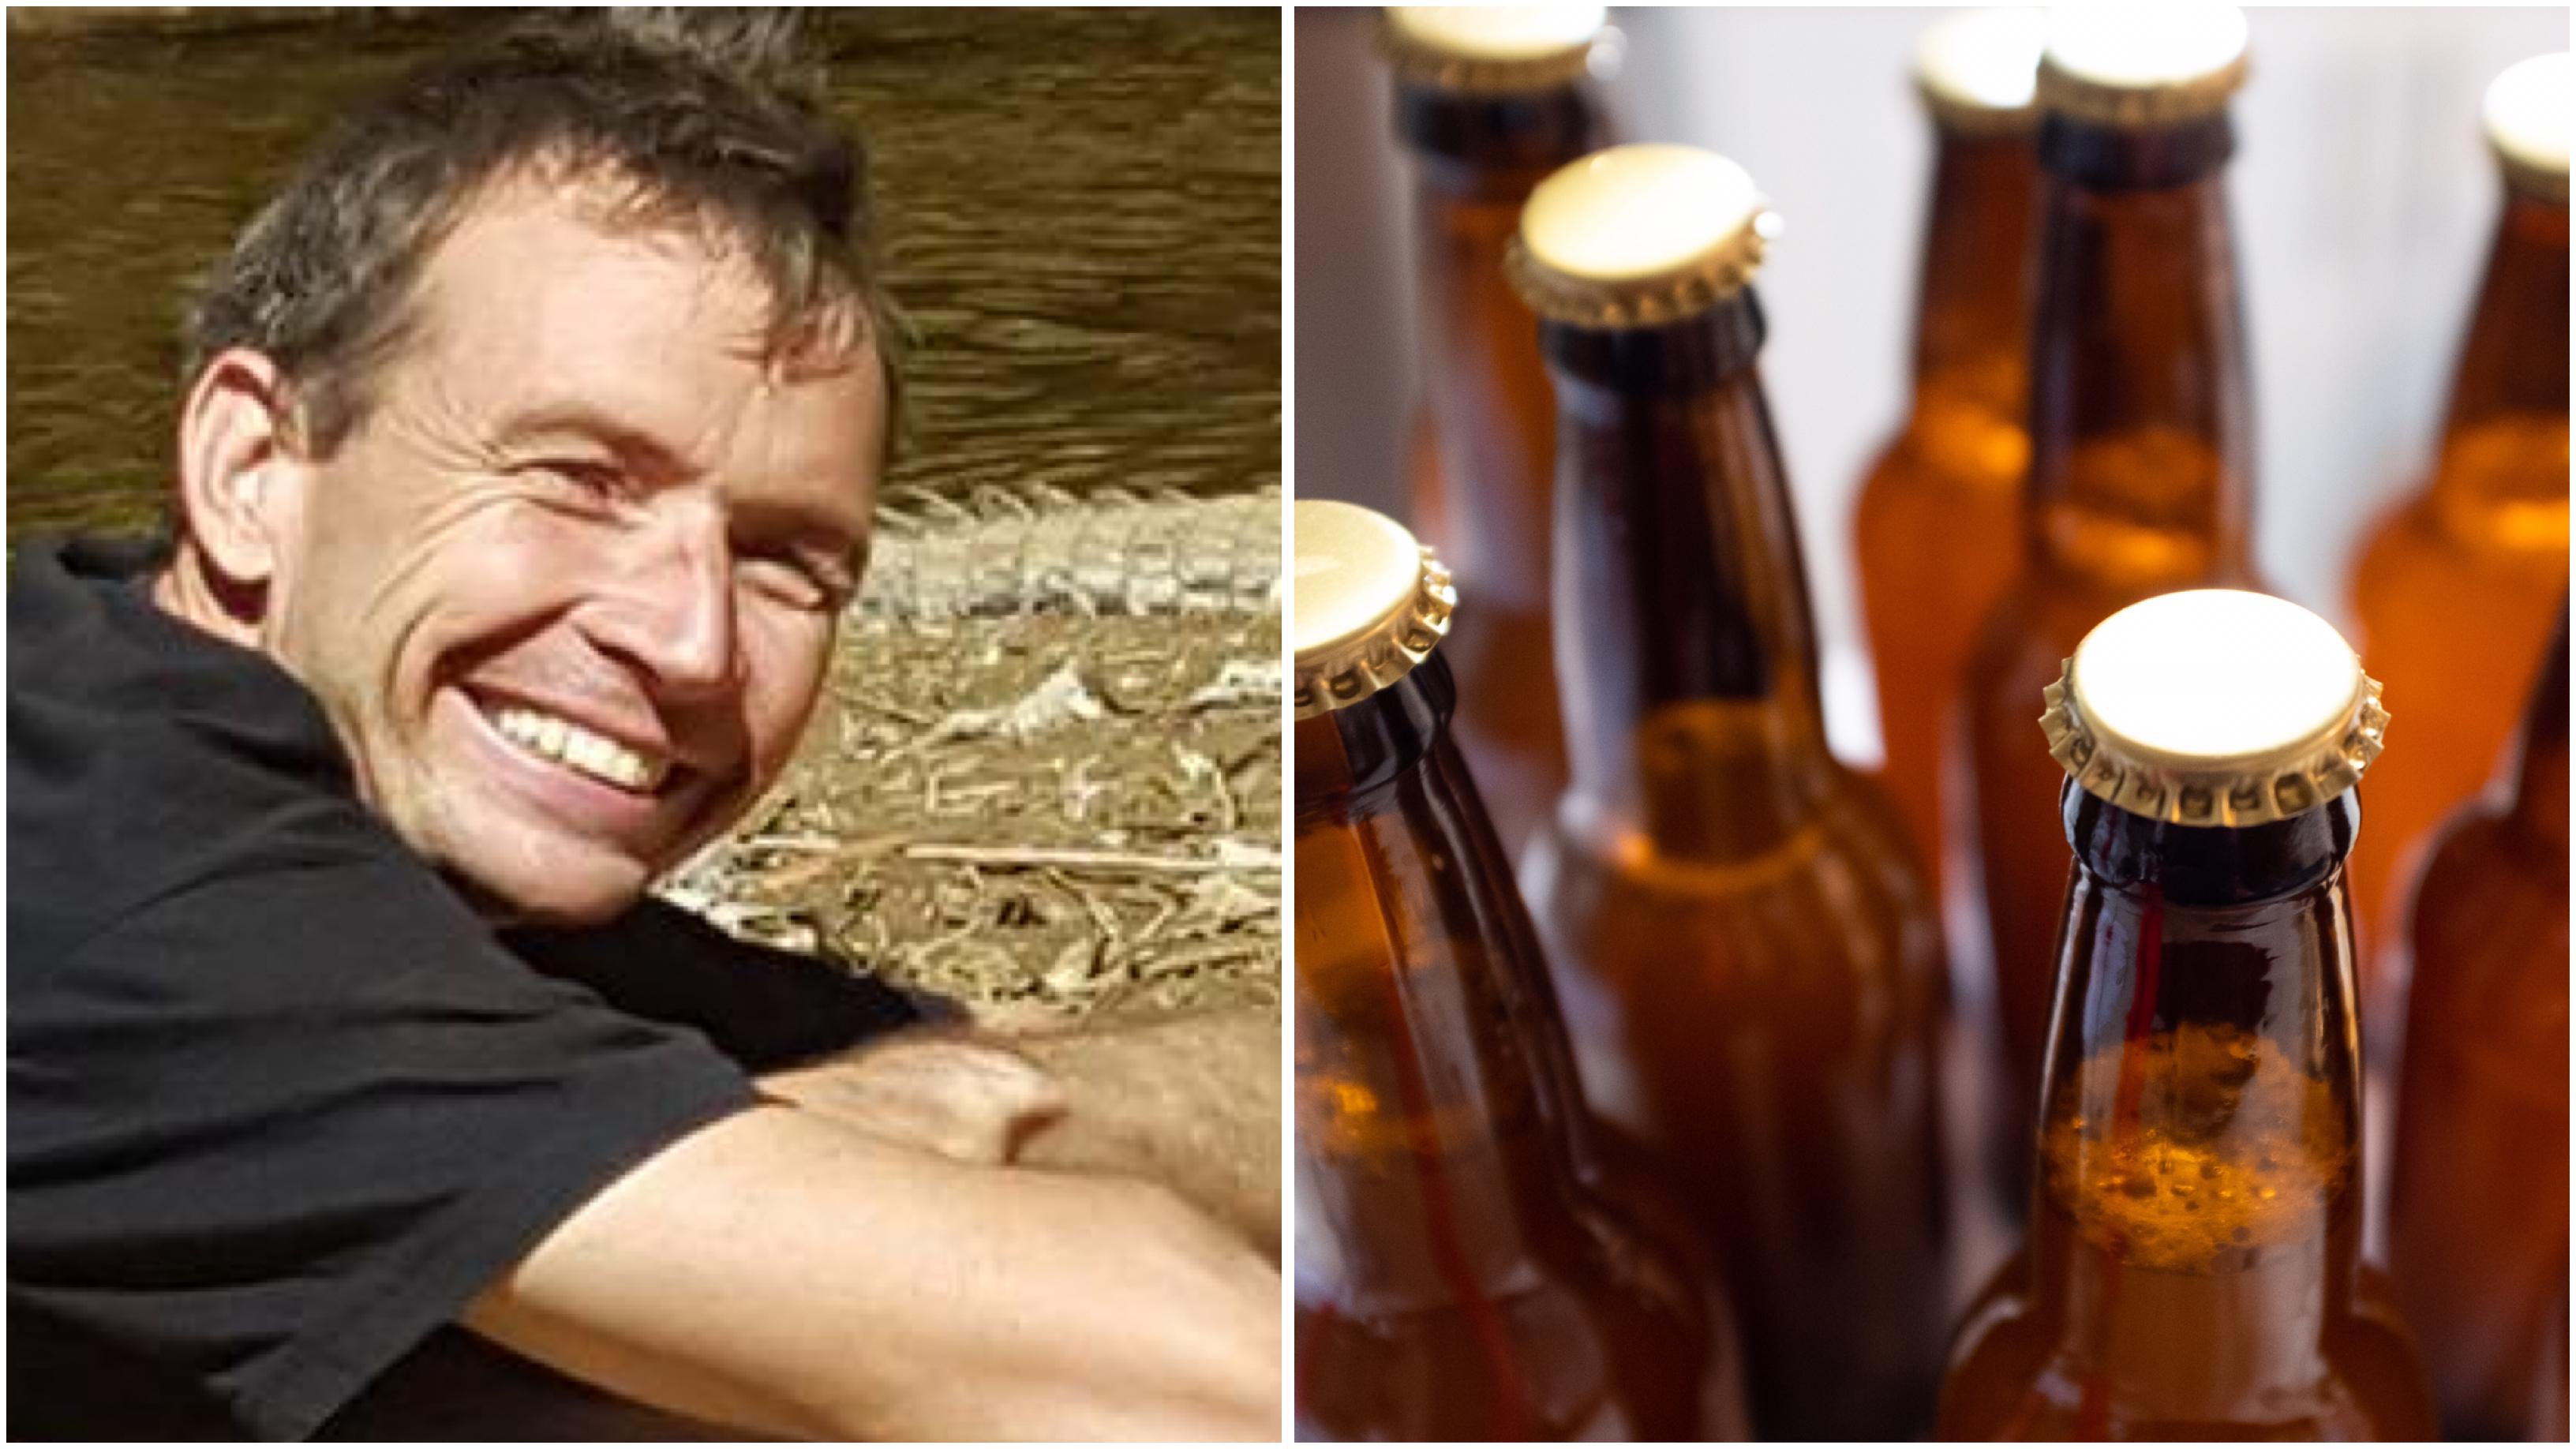 Cyclone Veronica: Karratha man's live stream of his beer fridge goes viral